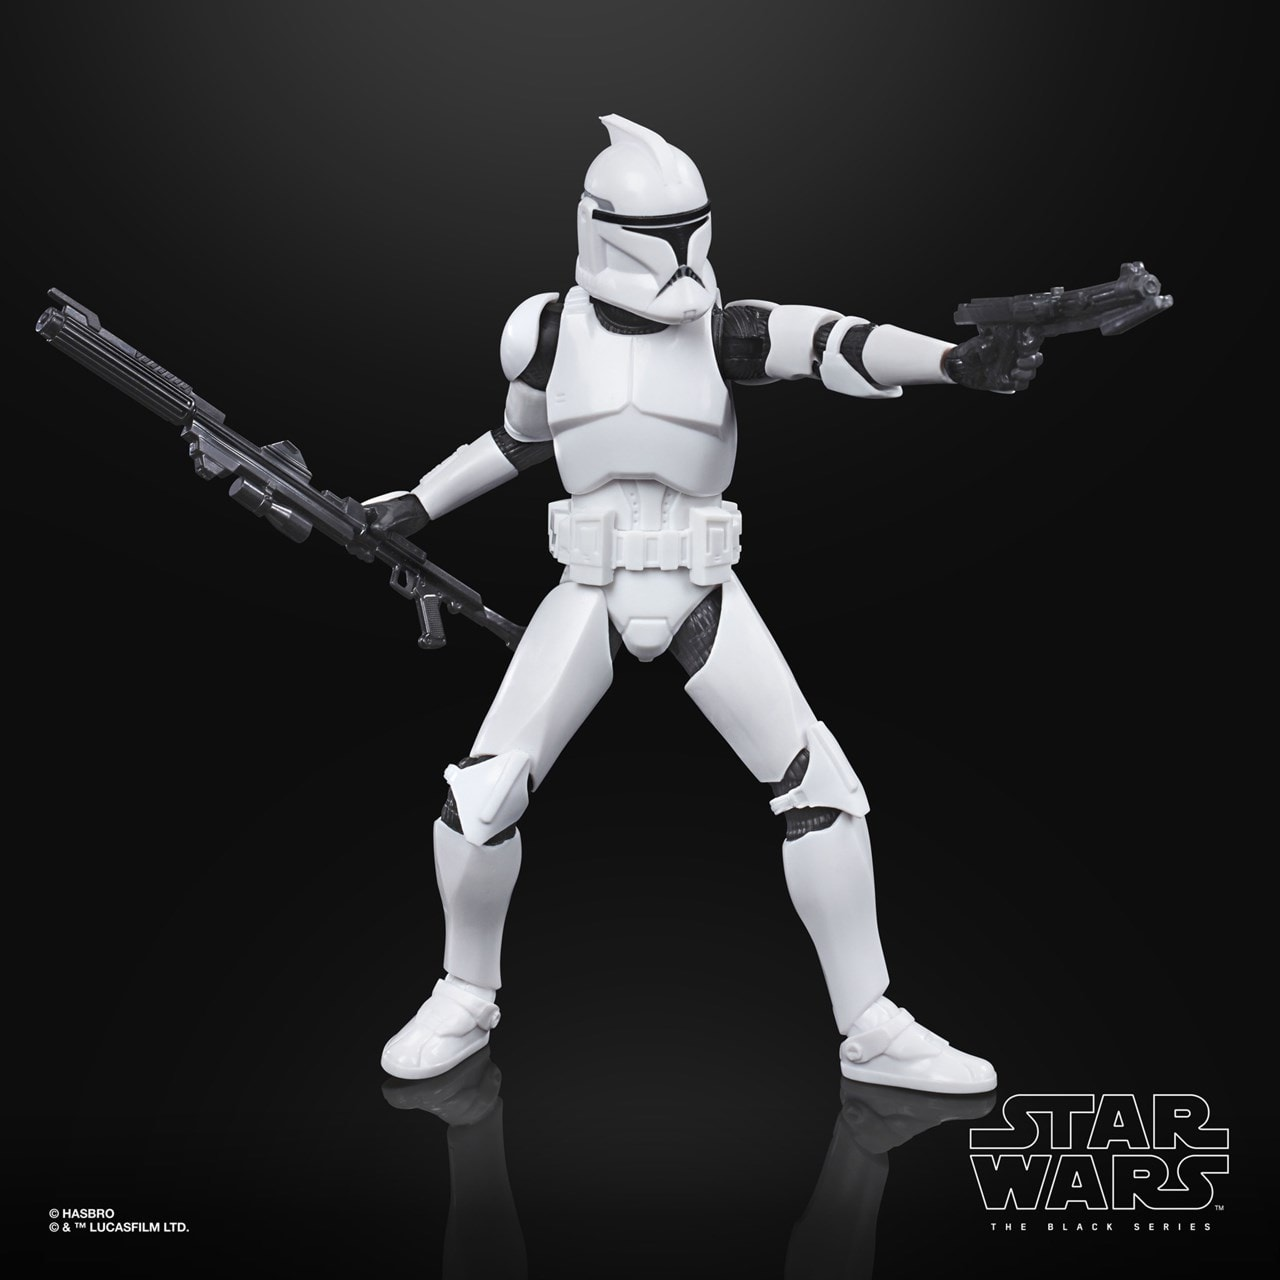 Clone Trooper: Clone Wars: Star Wars Black Series Action Figure - 2